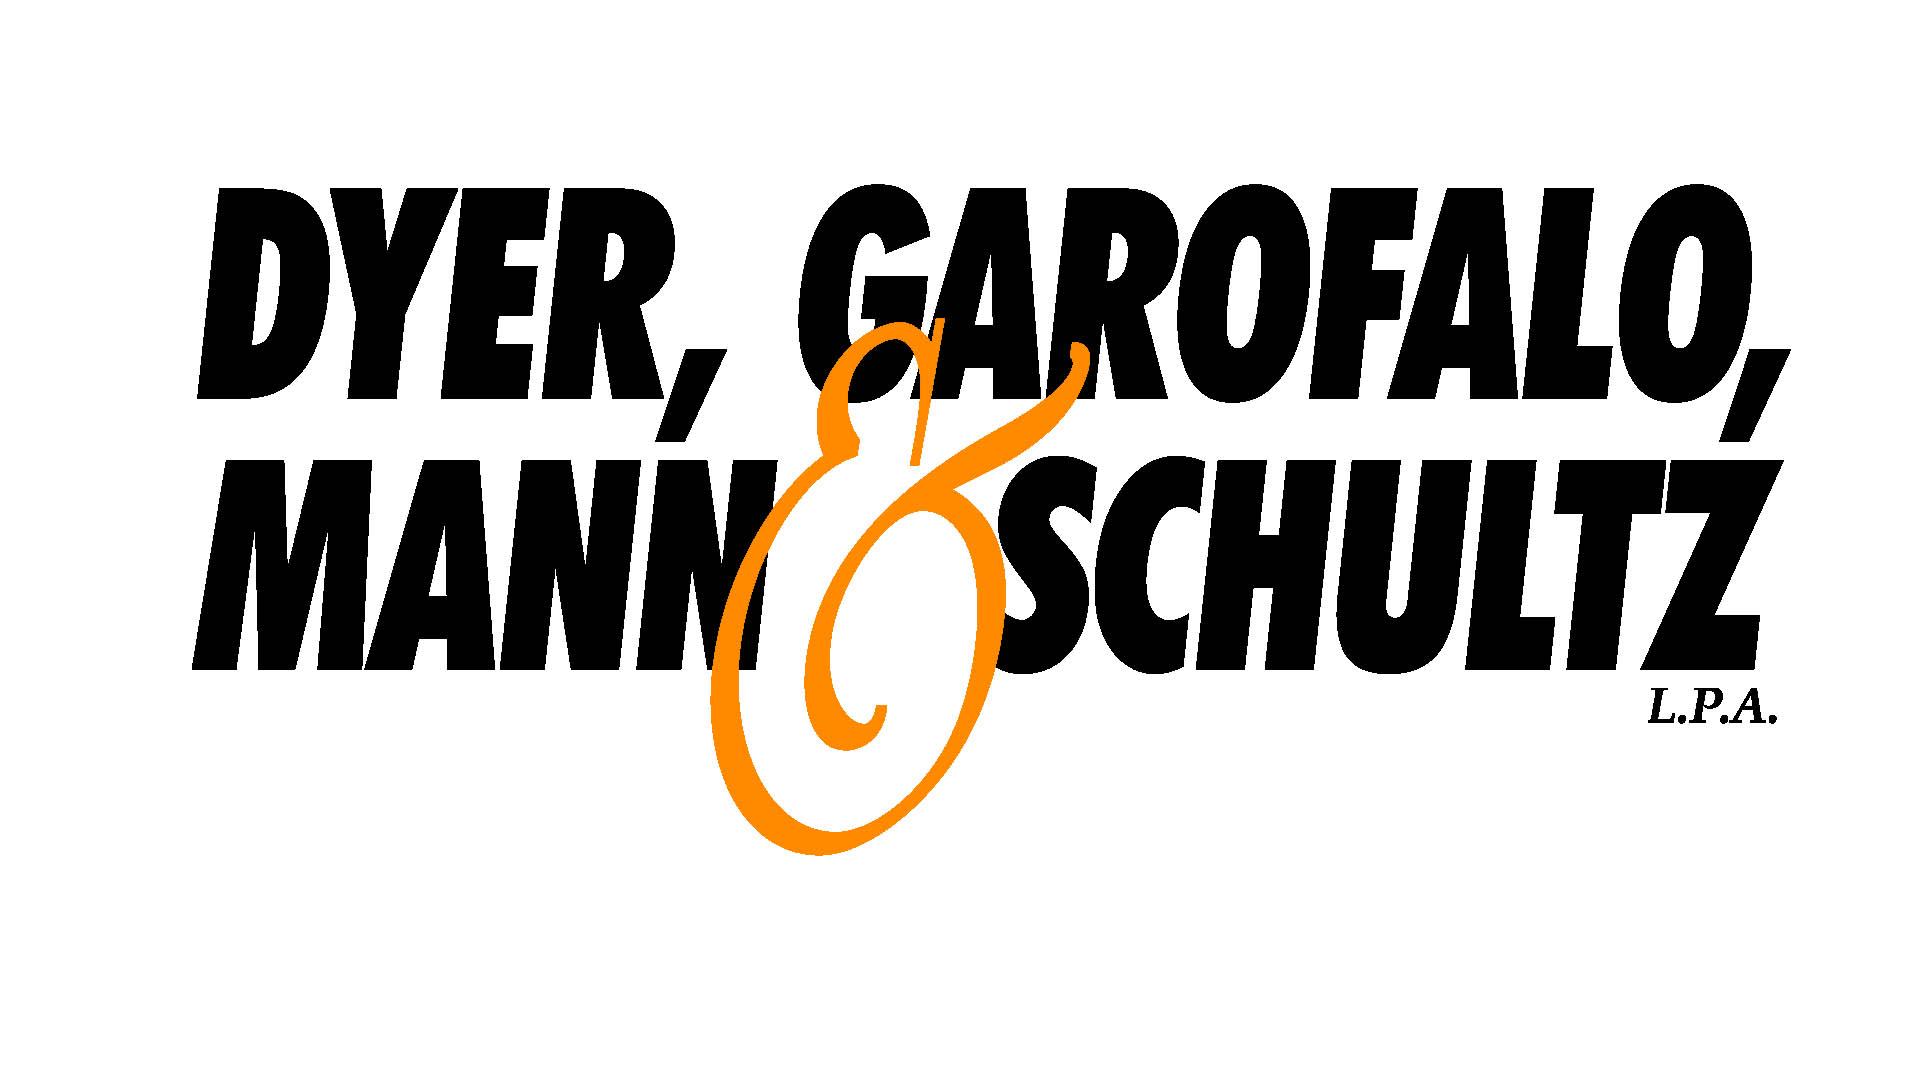 Dyer, Garofalo, Mann and Schultz